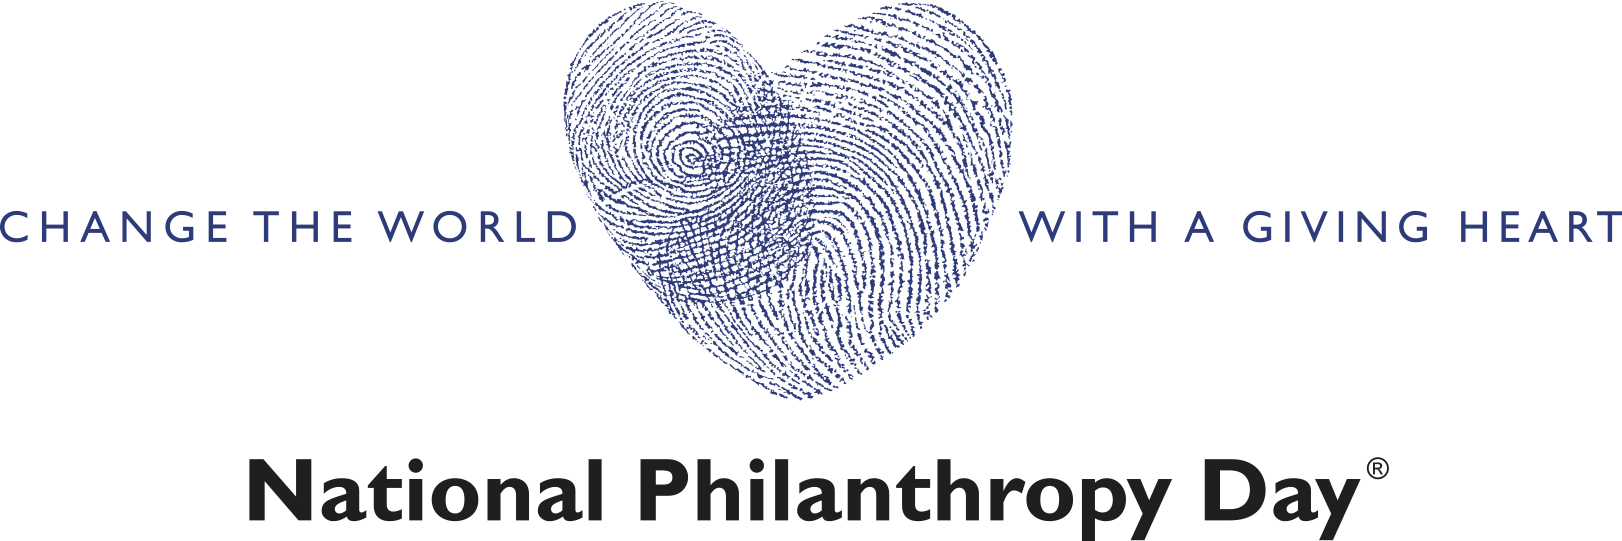 2021 National Philanthropy Day® and Generosity of Spirit™ Awards